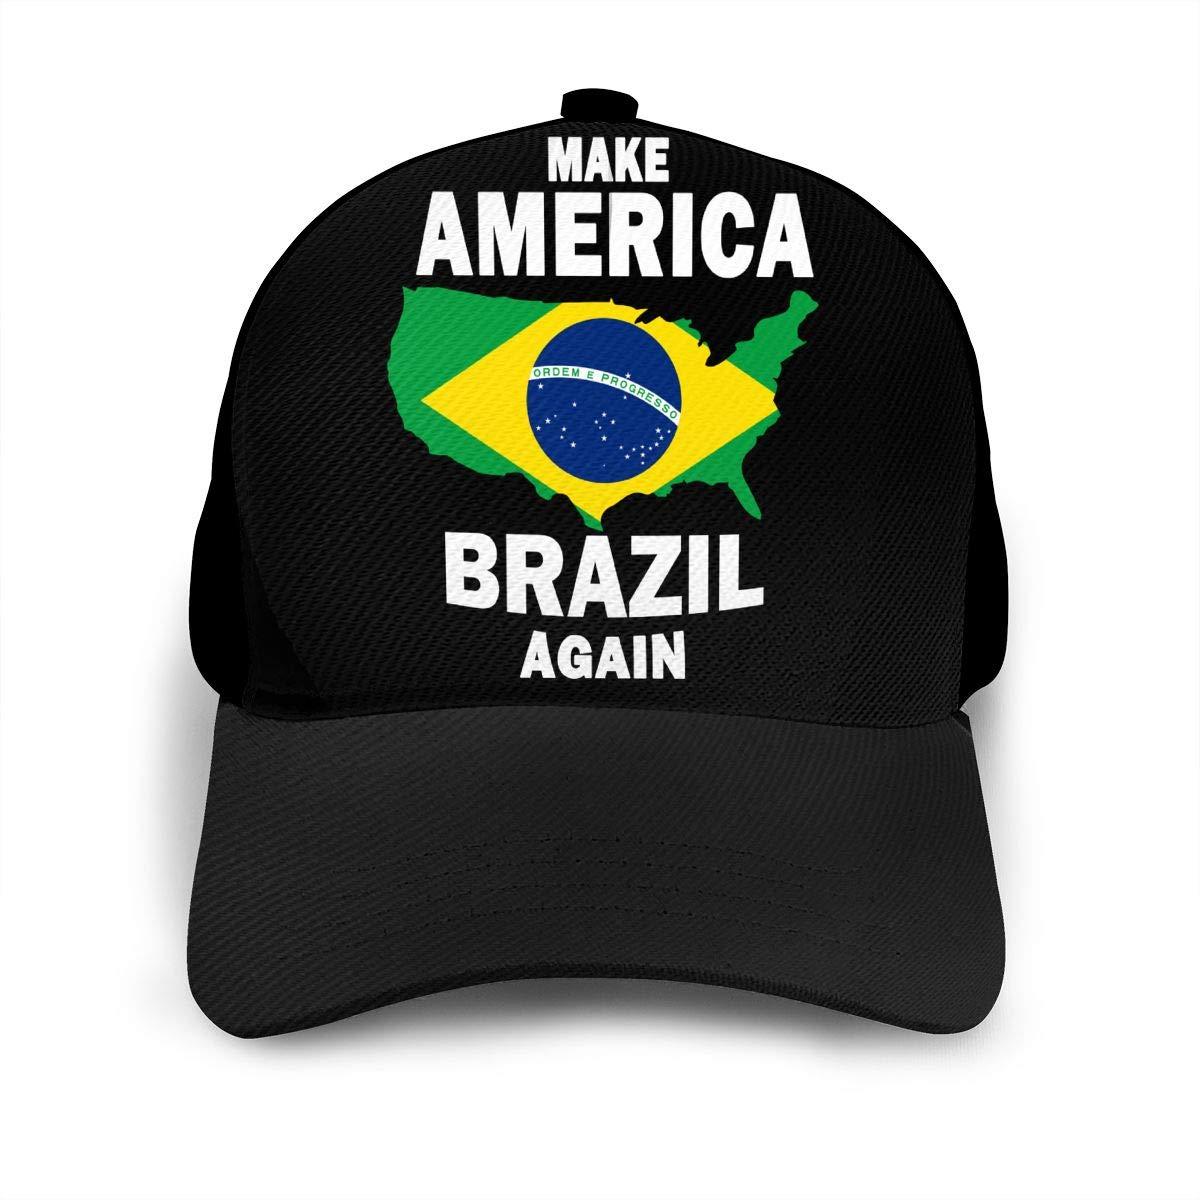 Y94OIW@MAO Make America Brazil Again Baseball Cap for Men and Women Cotton Mountaineering Cap